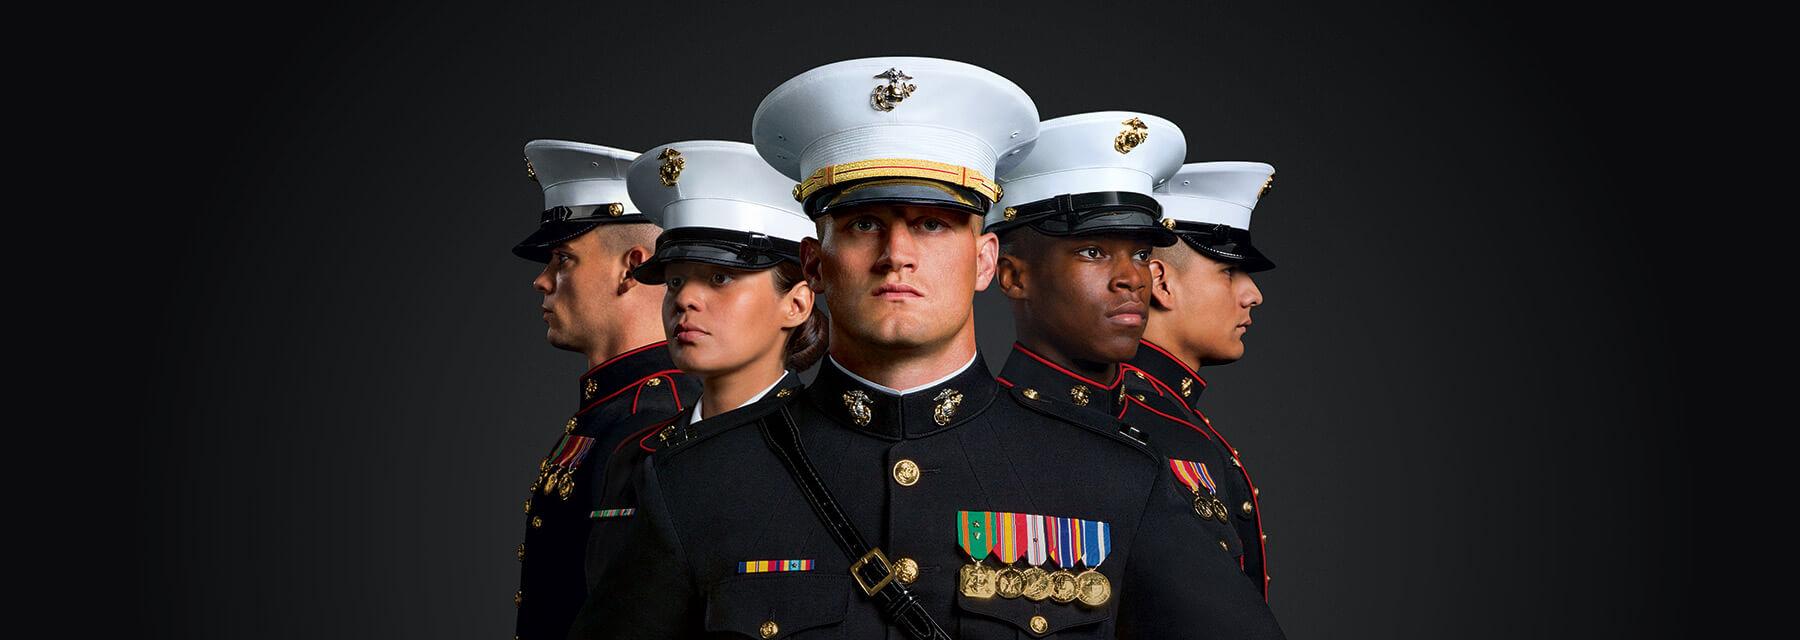 Are dress officer uniform